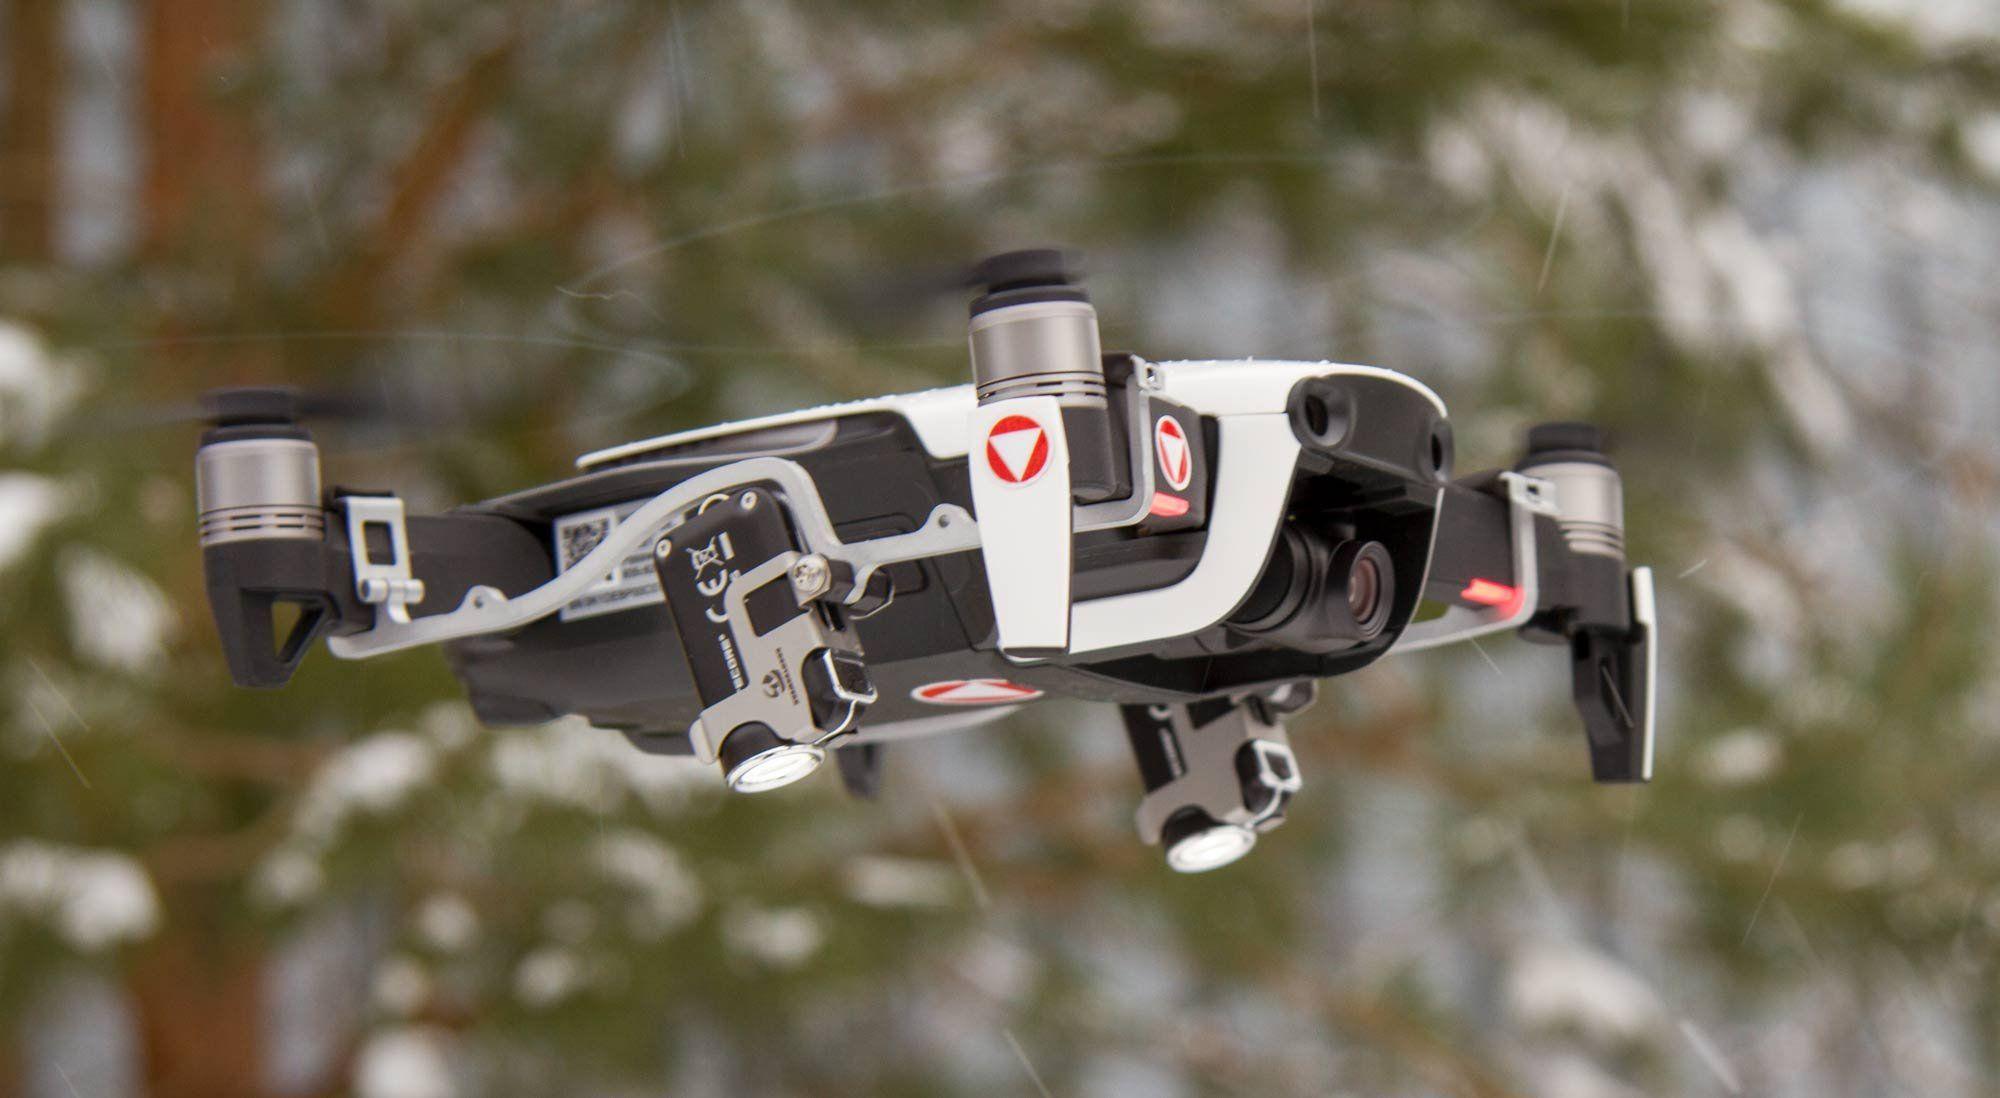 Roboterwerk Drone Dual Headlight/Nightflight LED Light DJI